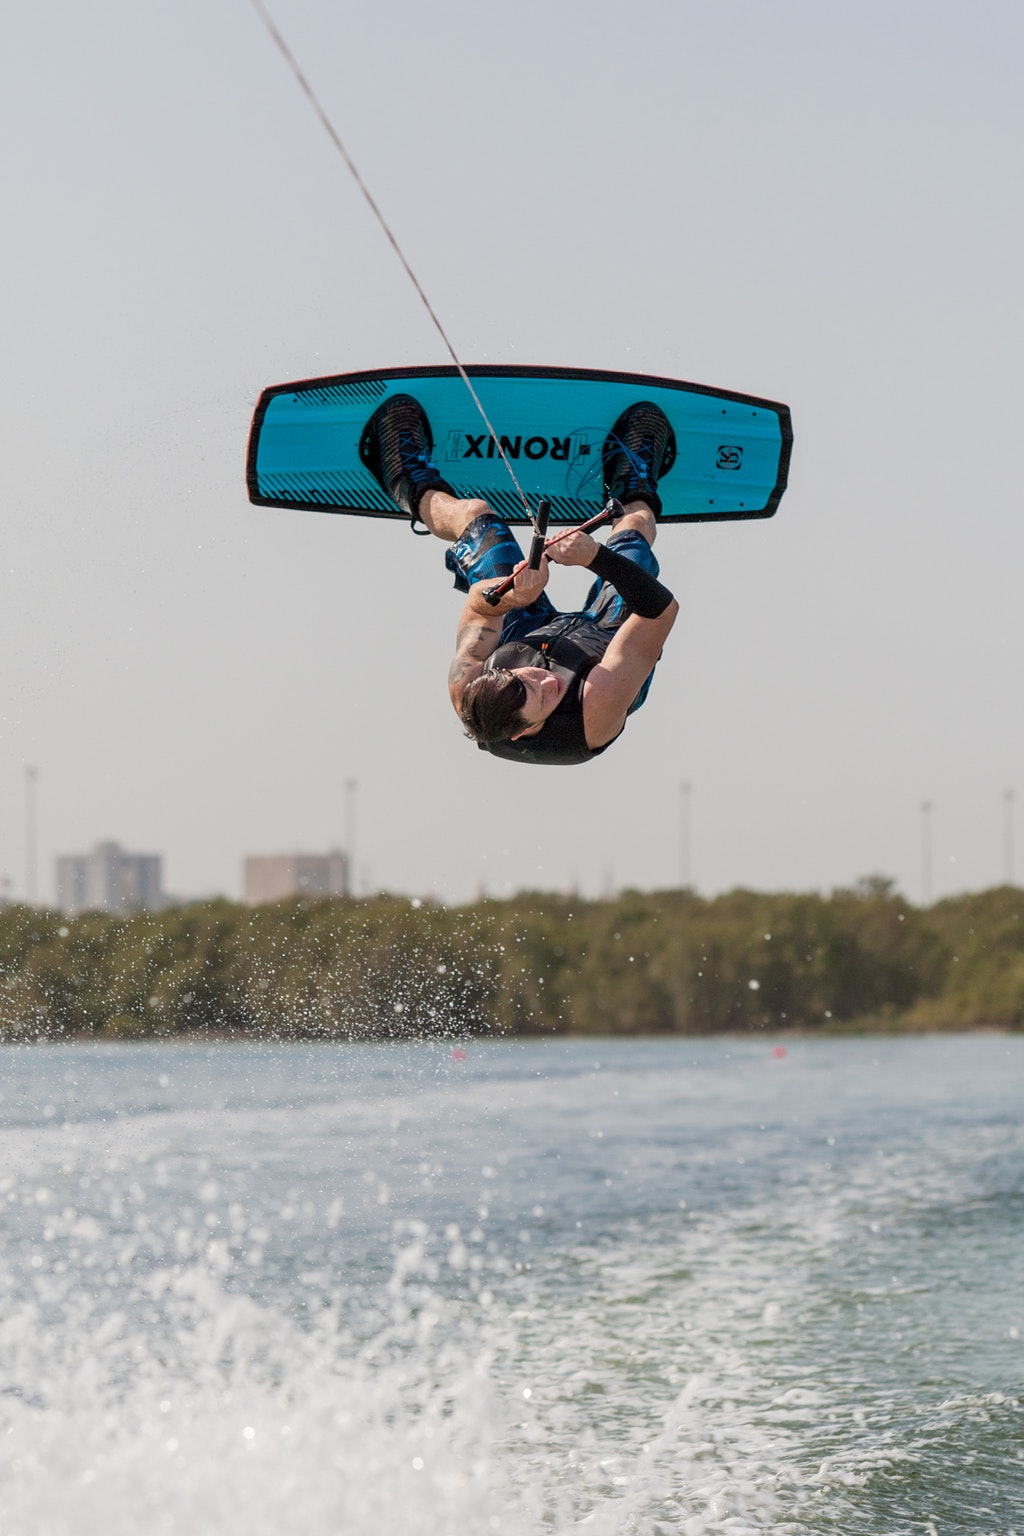 Matthew Mc Creadie at the 2019 Worlds Abu Dhabi